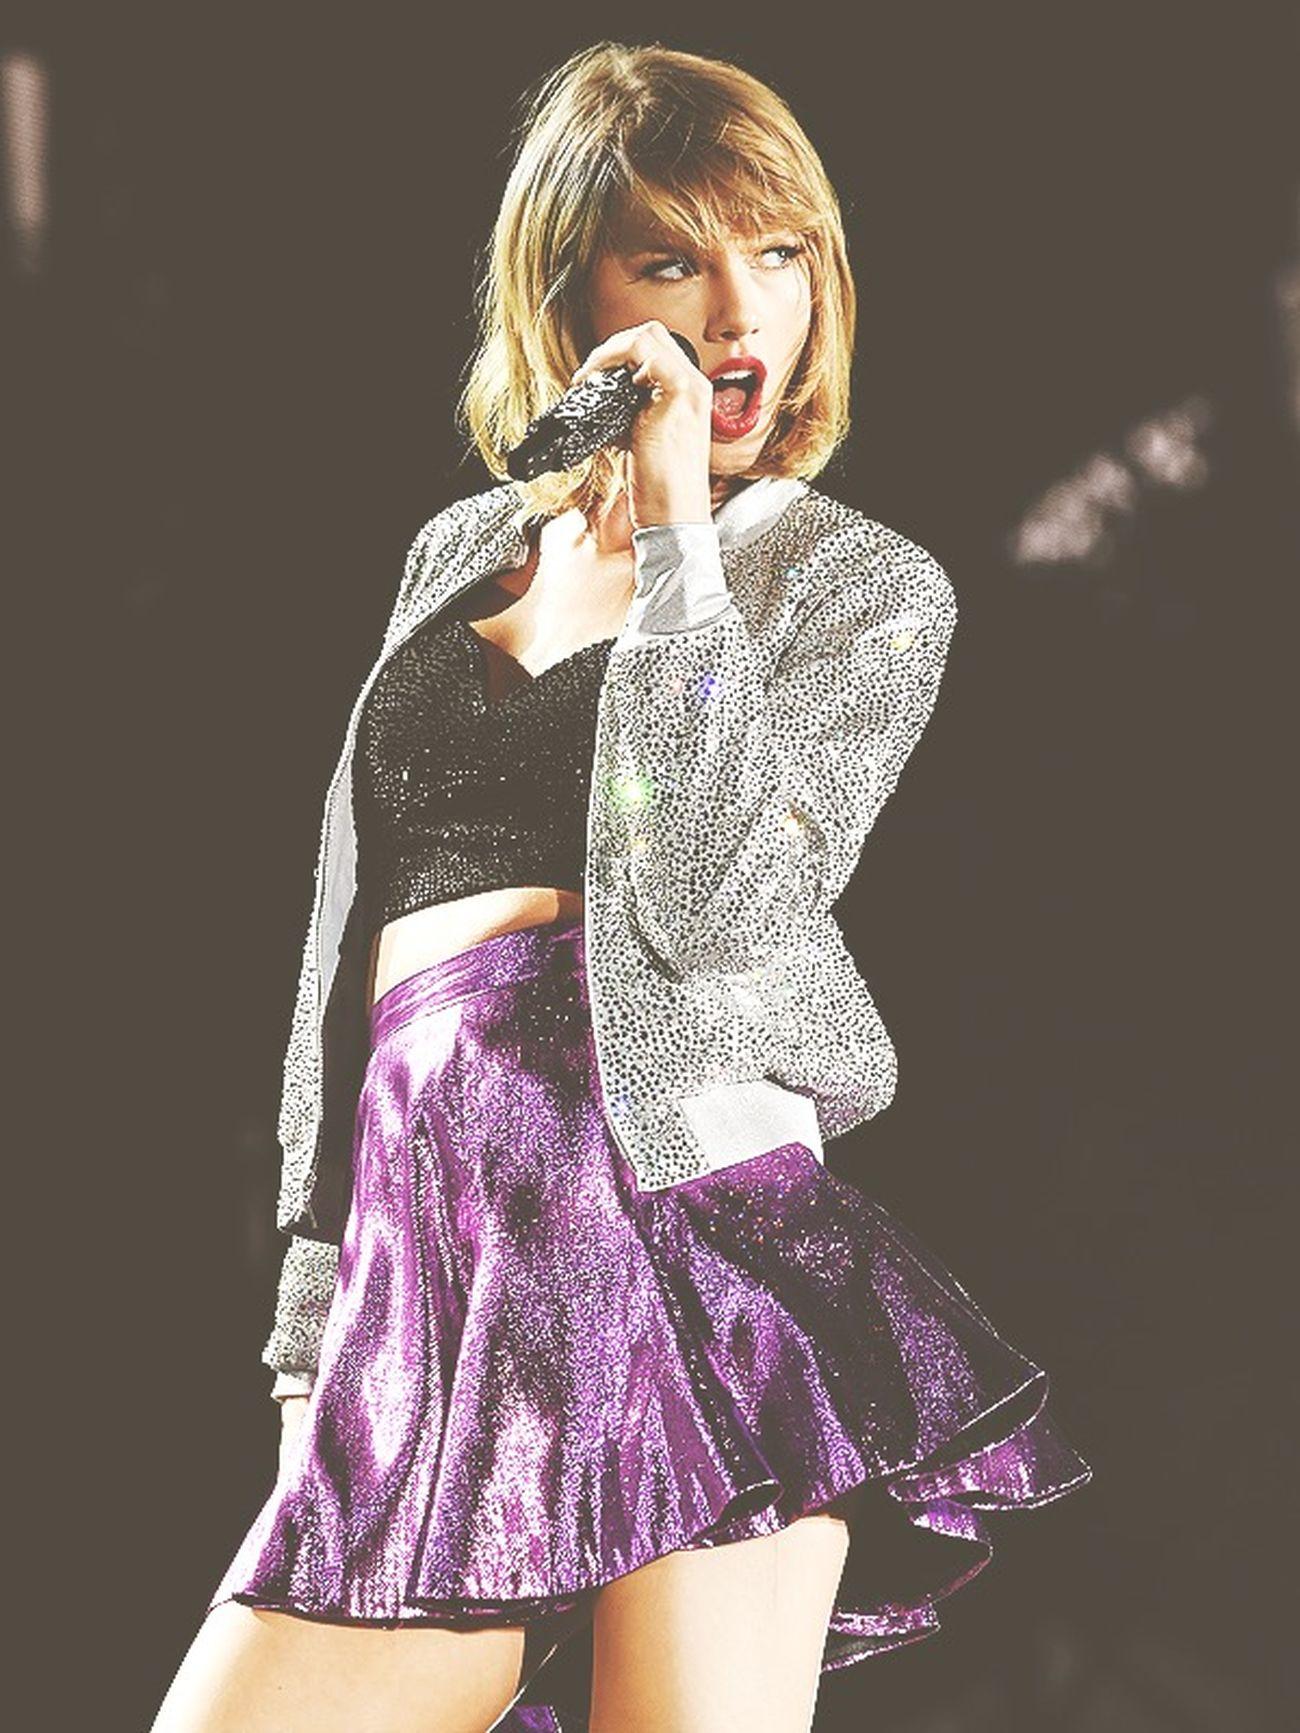 Taylor Swift 1989worldtour